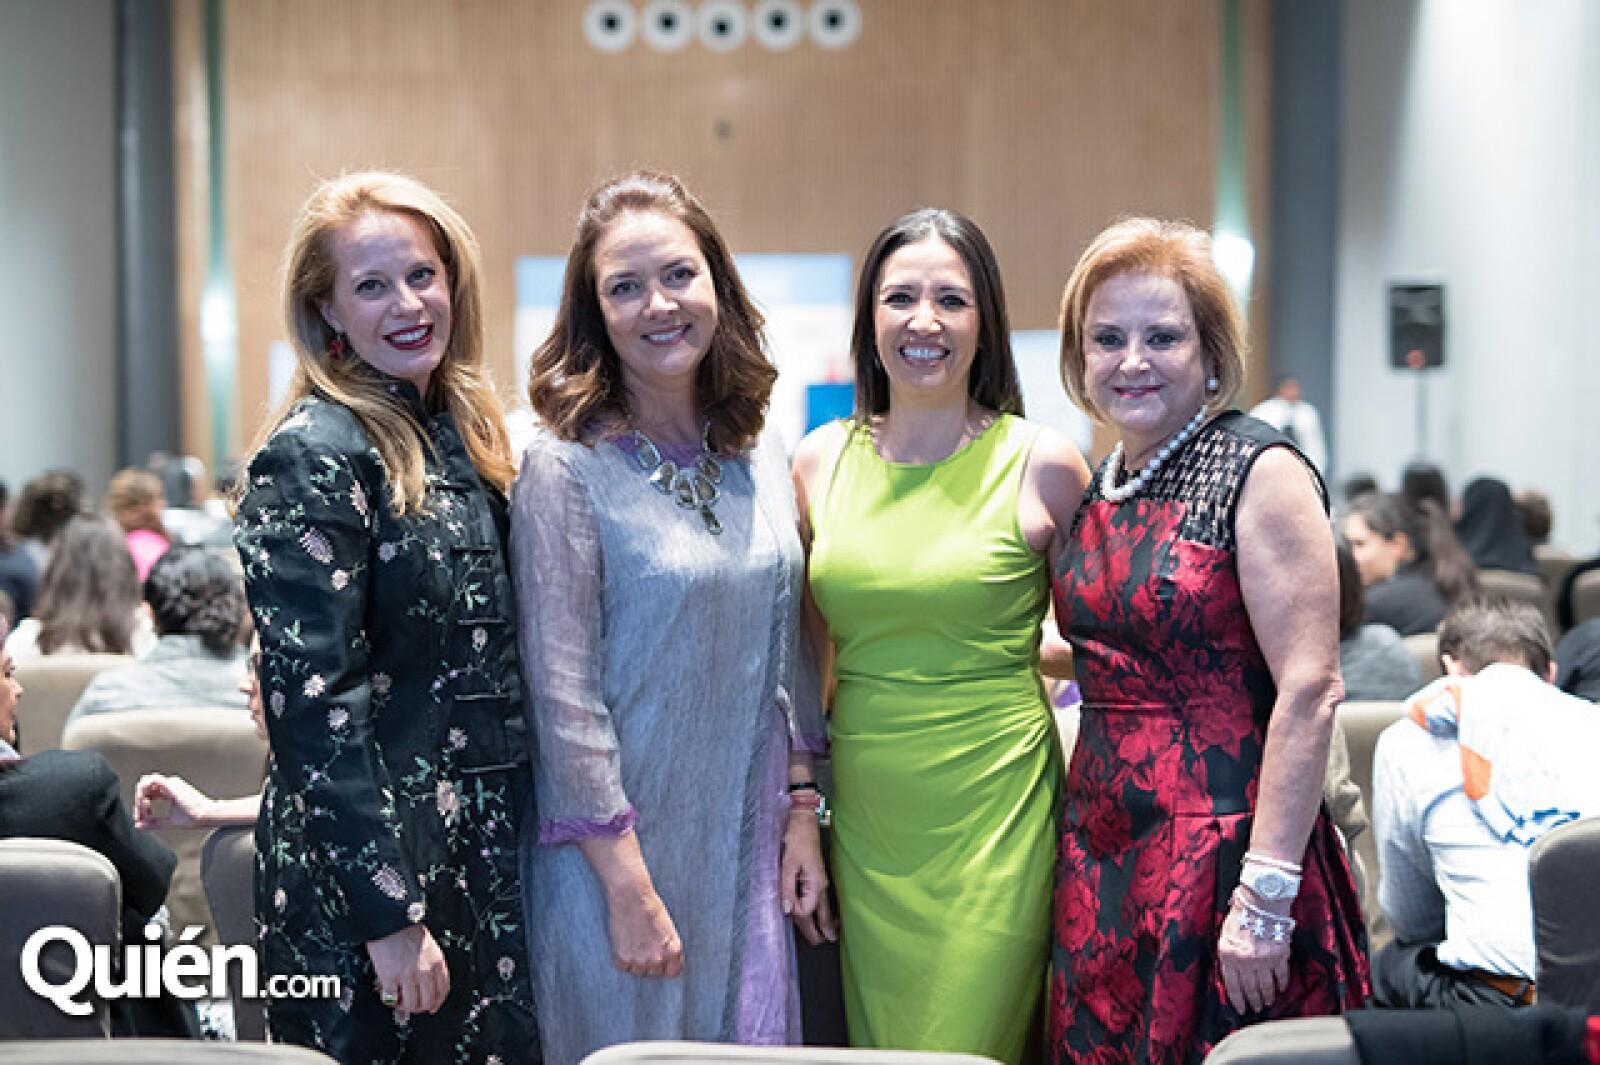 Mónica Fernández, Mónica Burillo de Larrea,Vanessa Caldera y Stella Chedraui